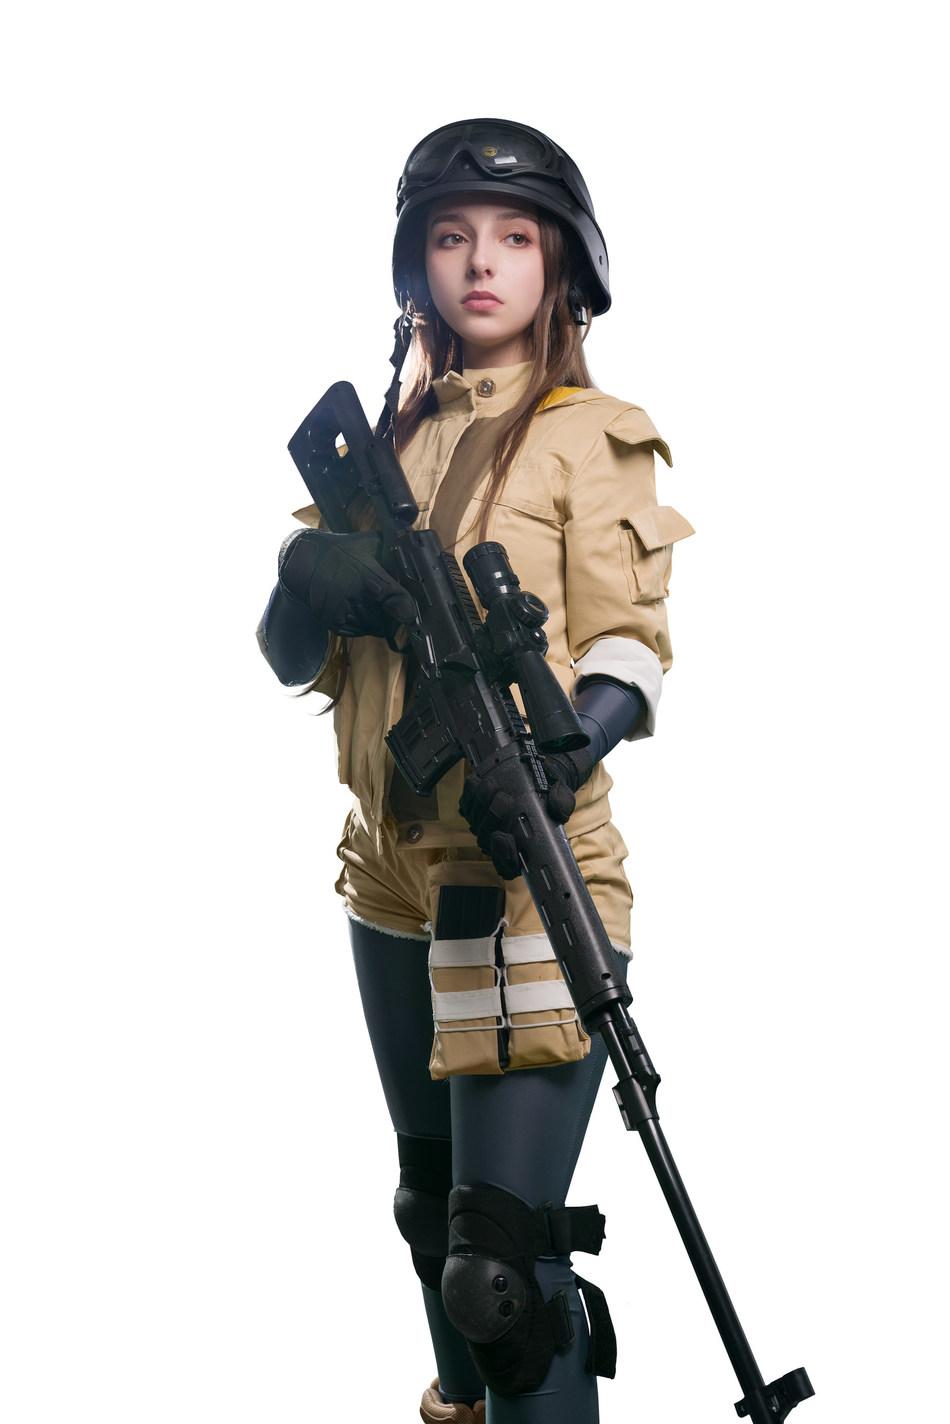 cosplay photo